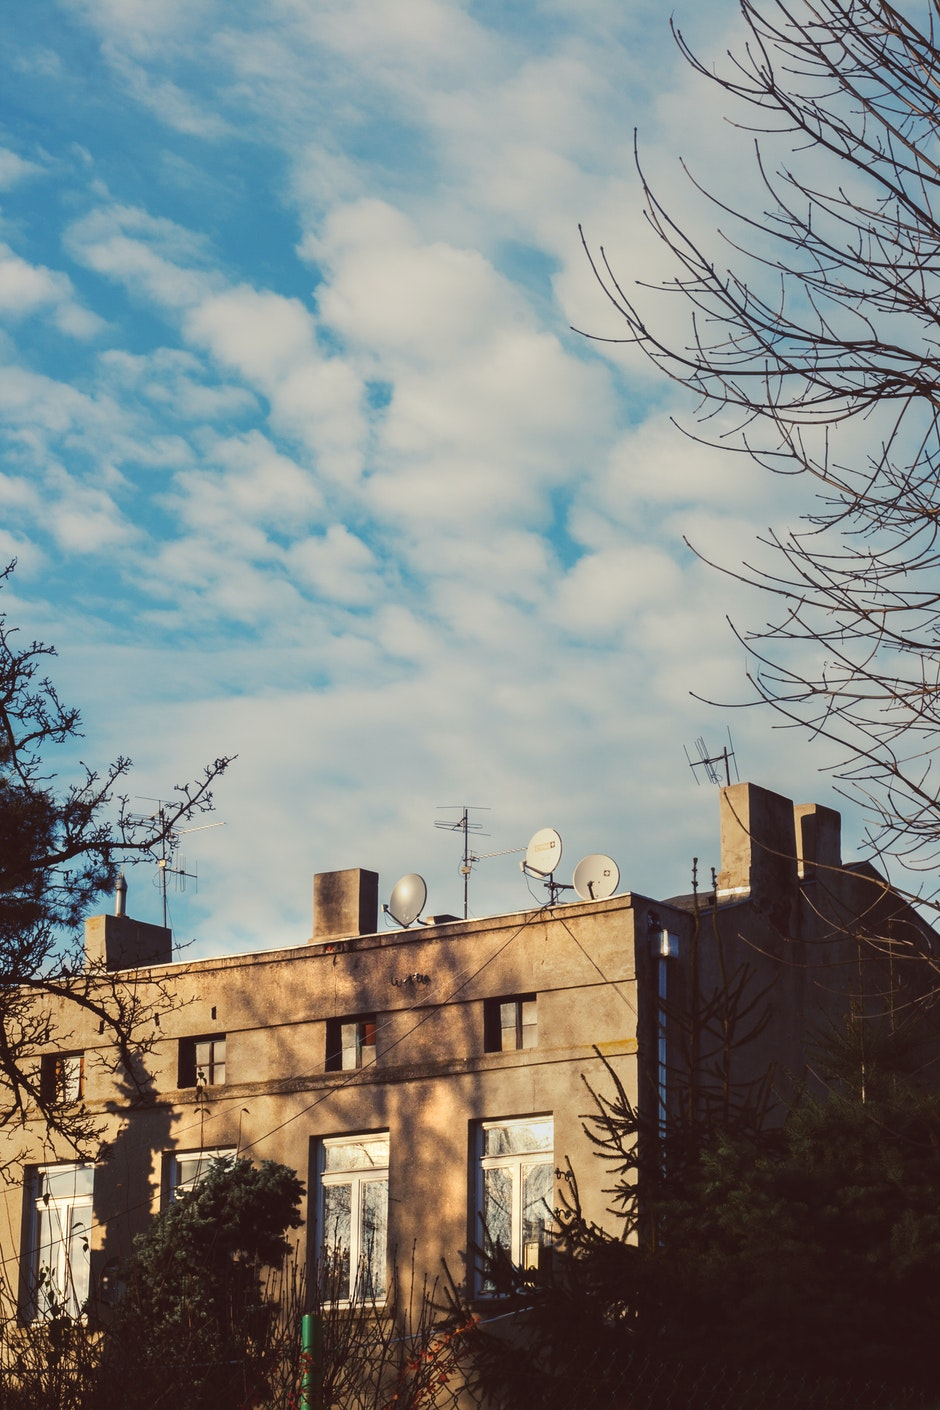 Tenement house & blue sky